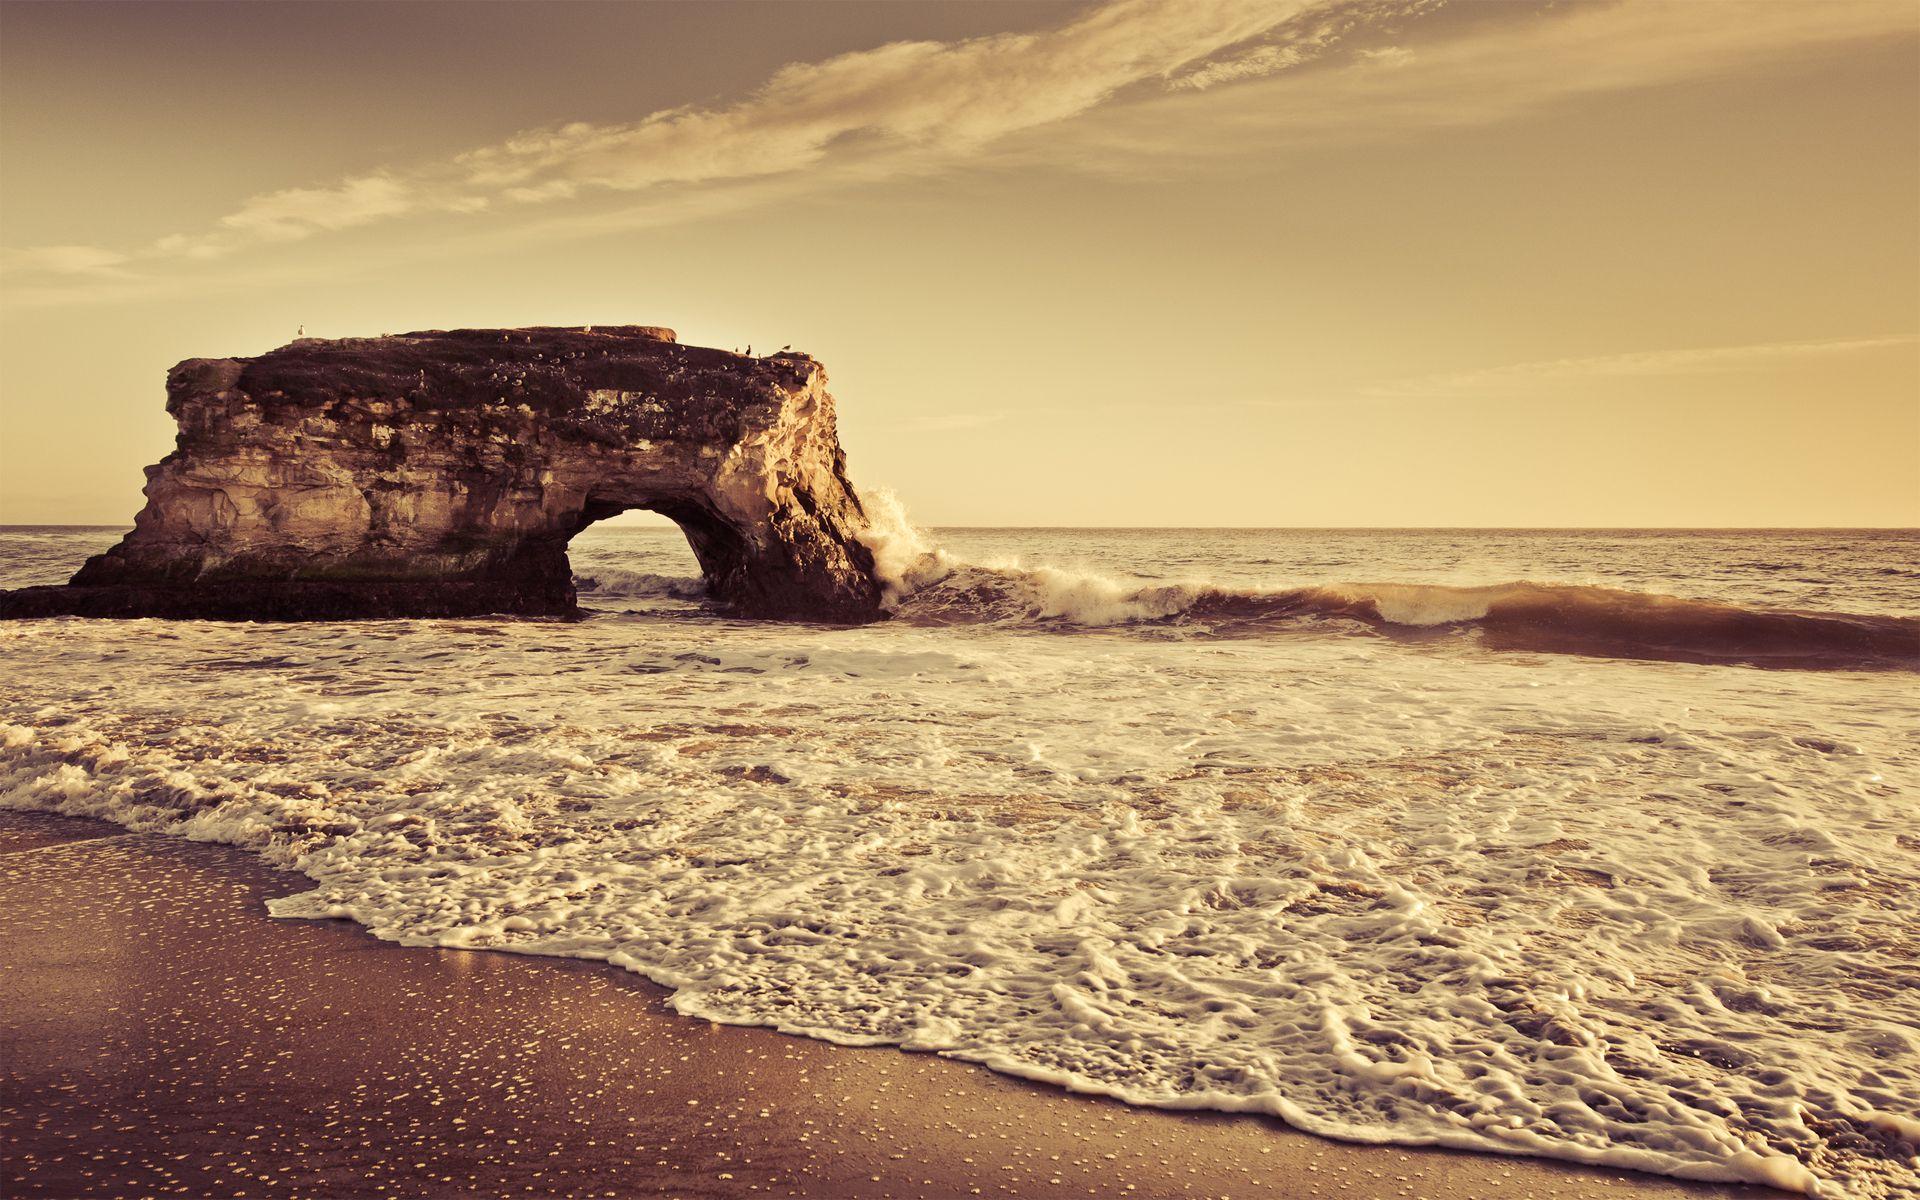 summer beach tumblr photography.  Beach Summer Beach Tumblr Photography Images 6 HD Wallpapers In M